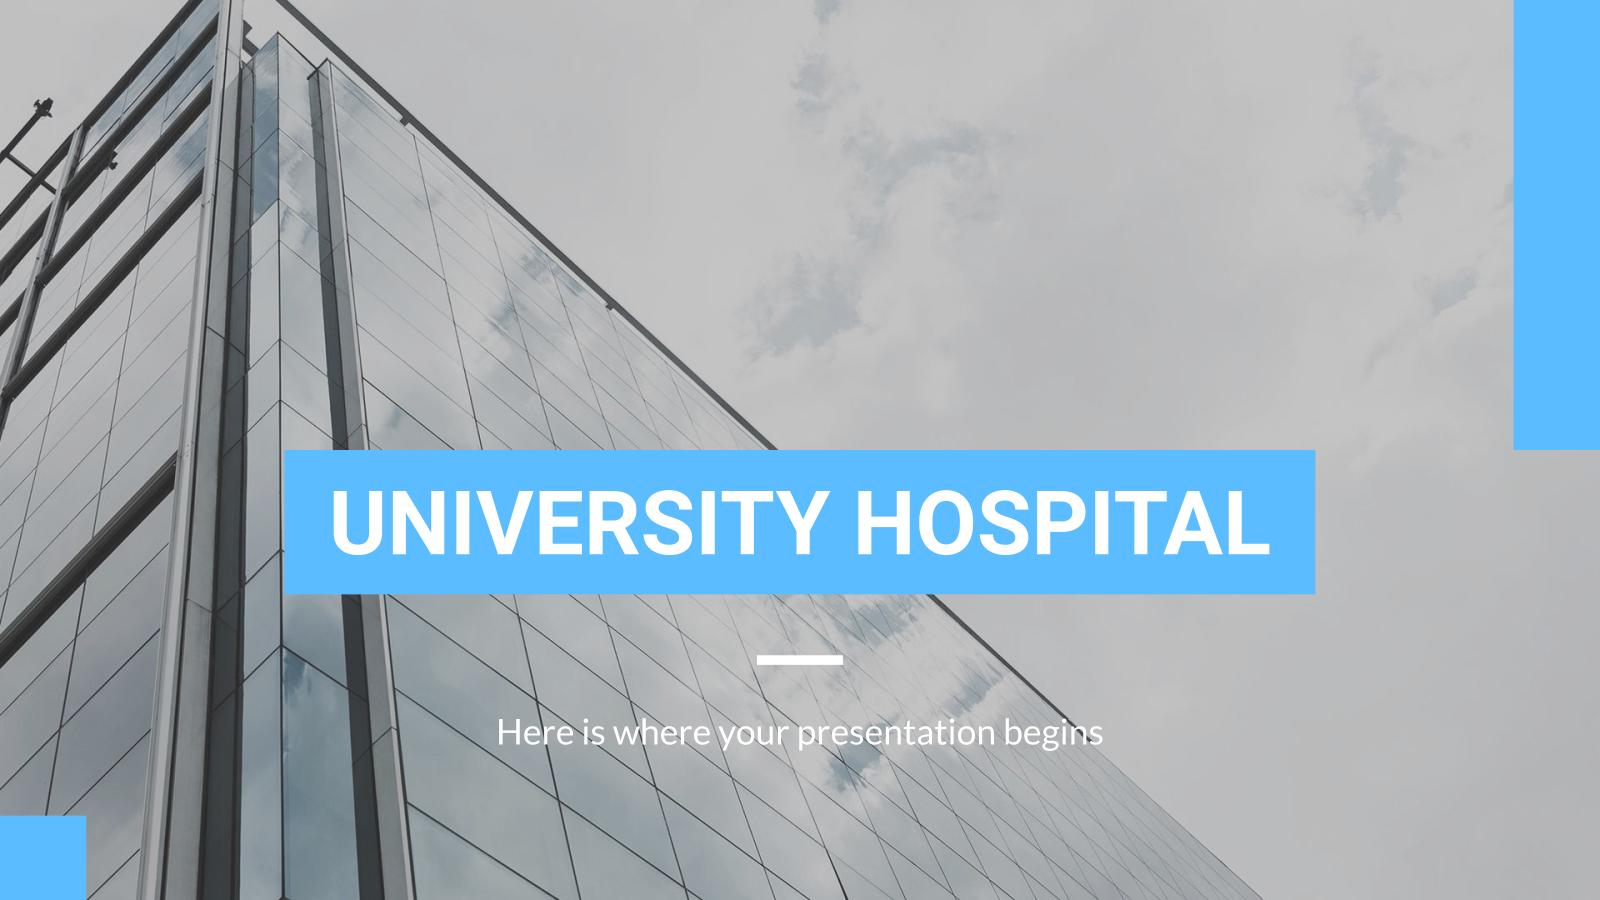 University Hospital presentation template